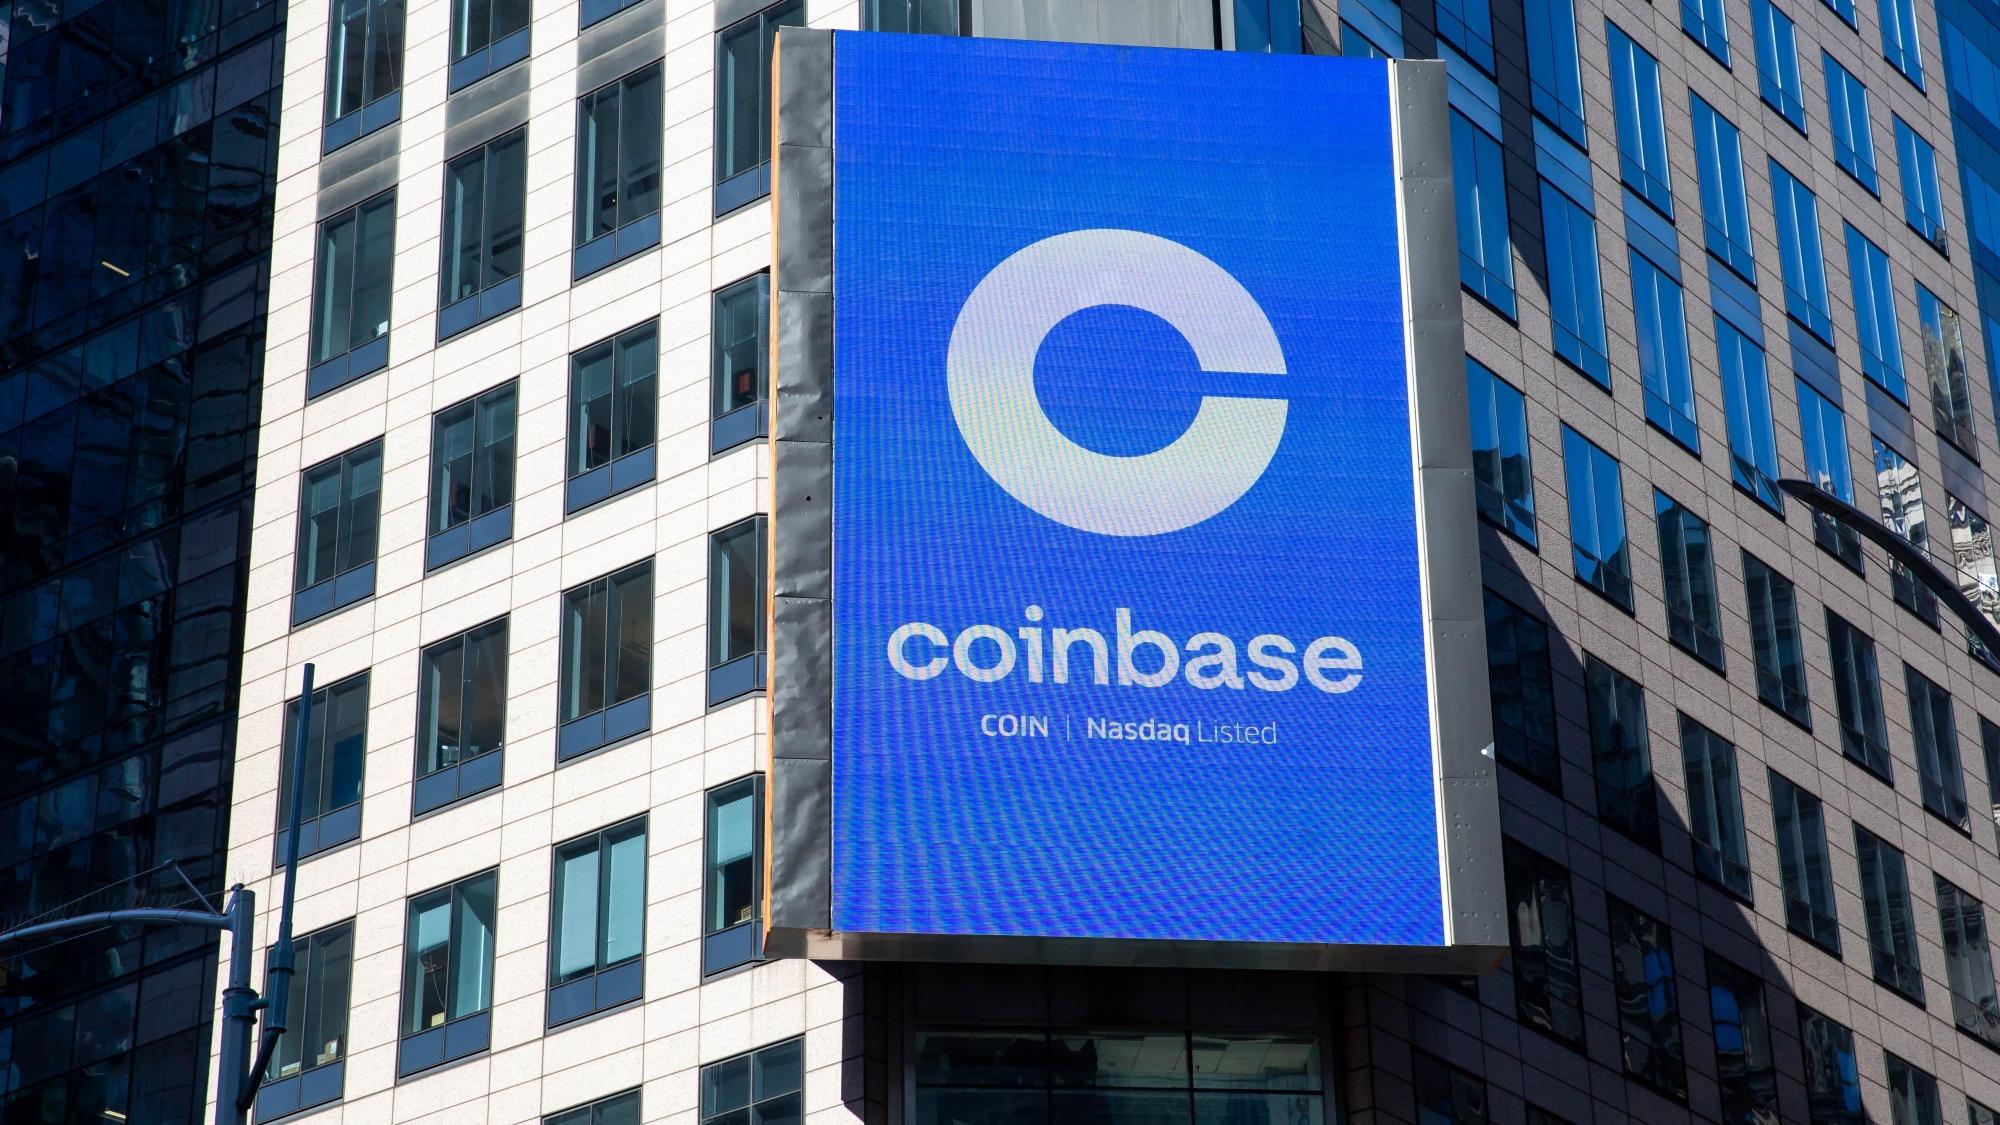 Coinbase Hires Former Deputy Director of SEC